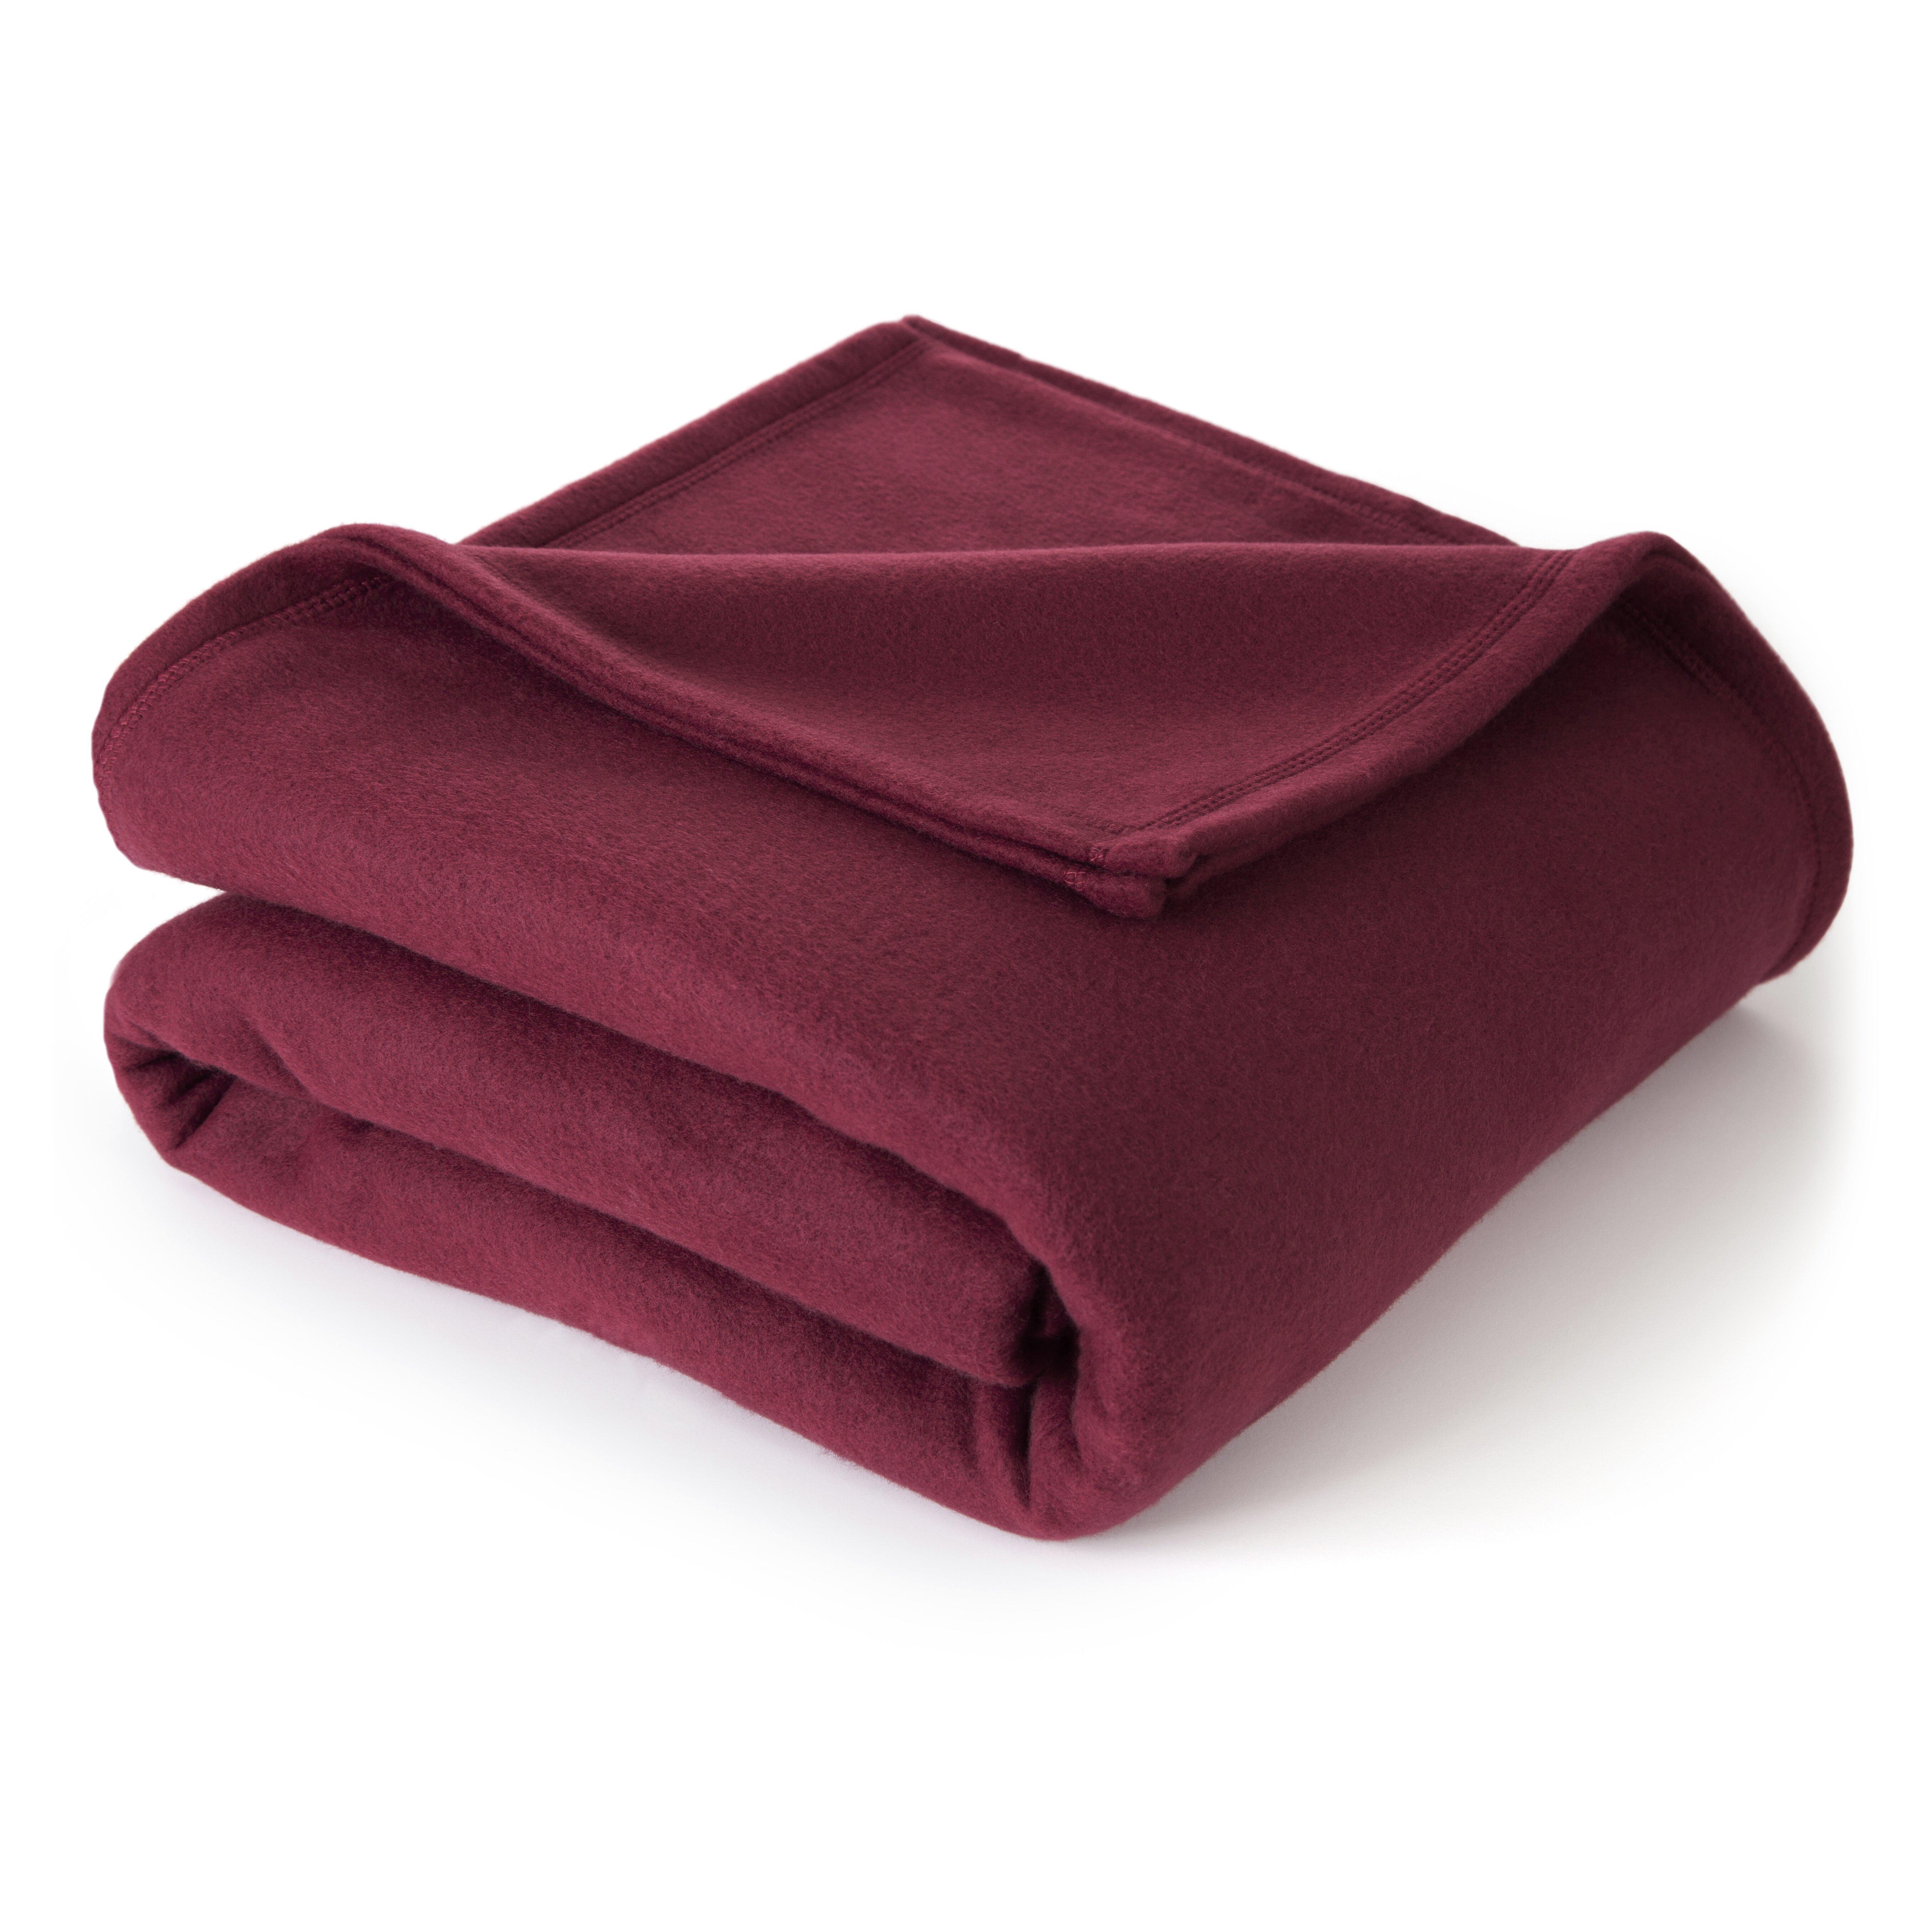 Vellux Martex Super Soft Blanket Amp Reviews Wayfair